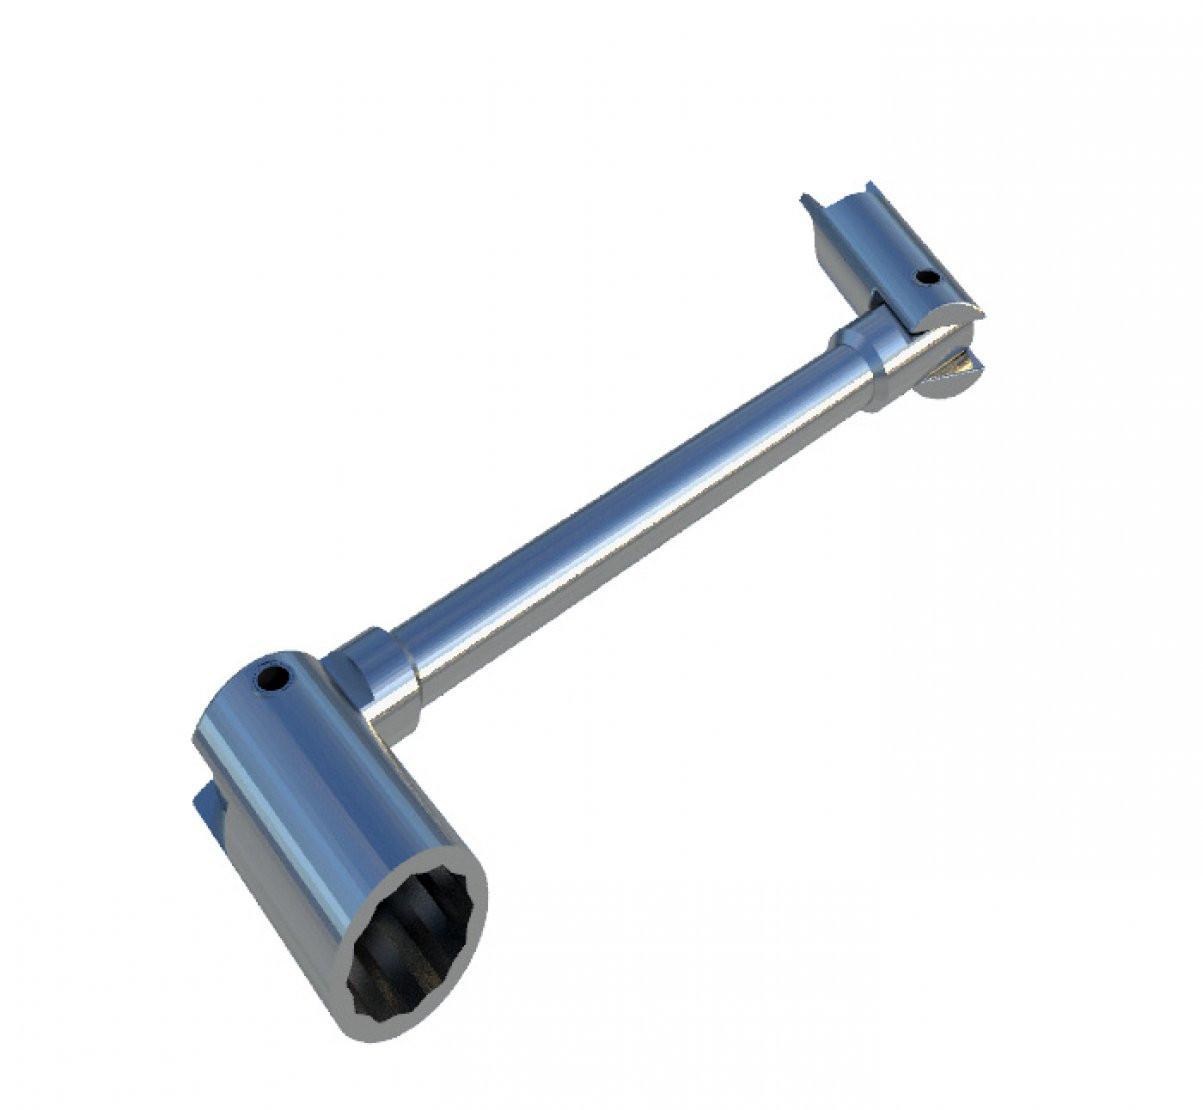 SECURASITE Lockable Grip Lock Coupler Spanner for Heras fencing